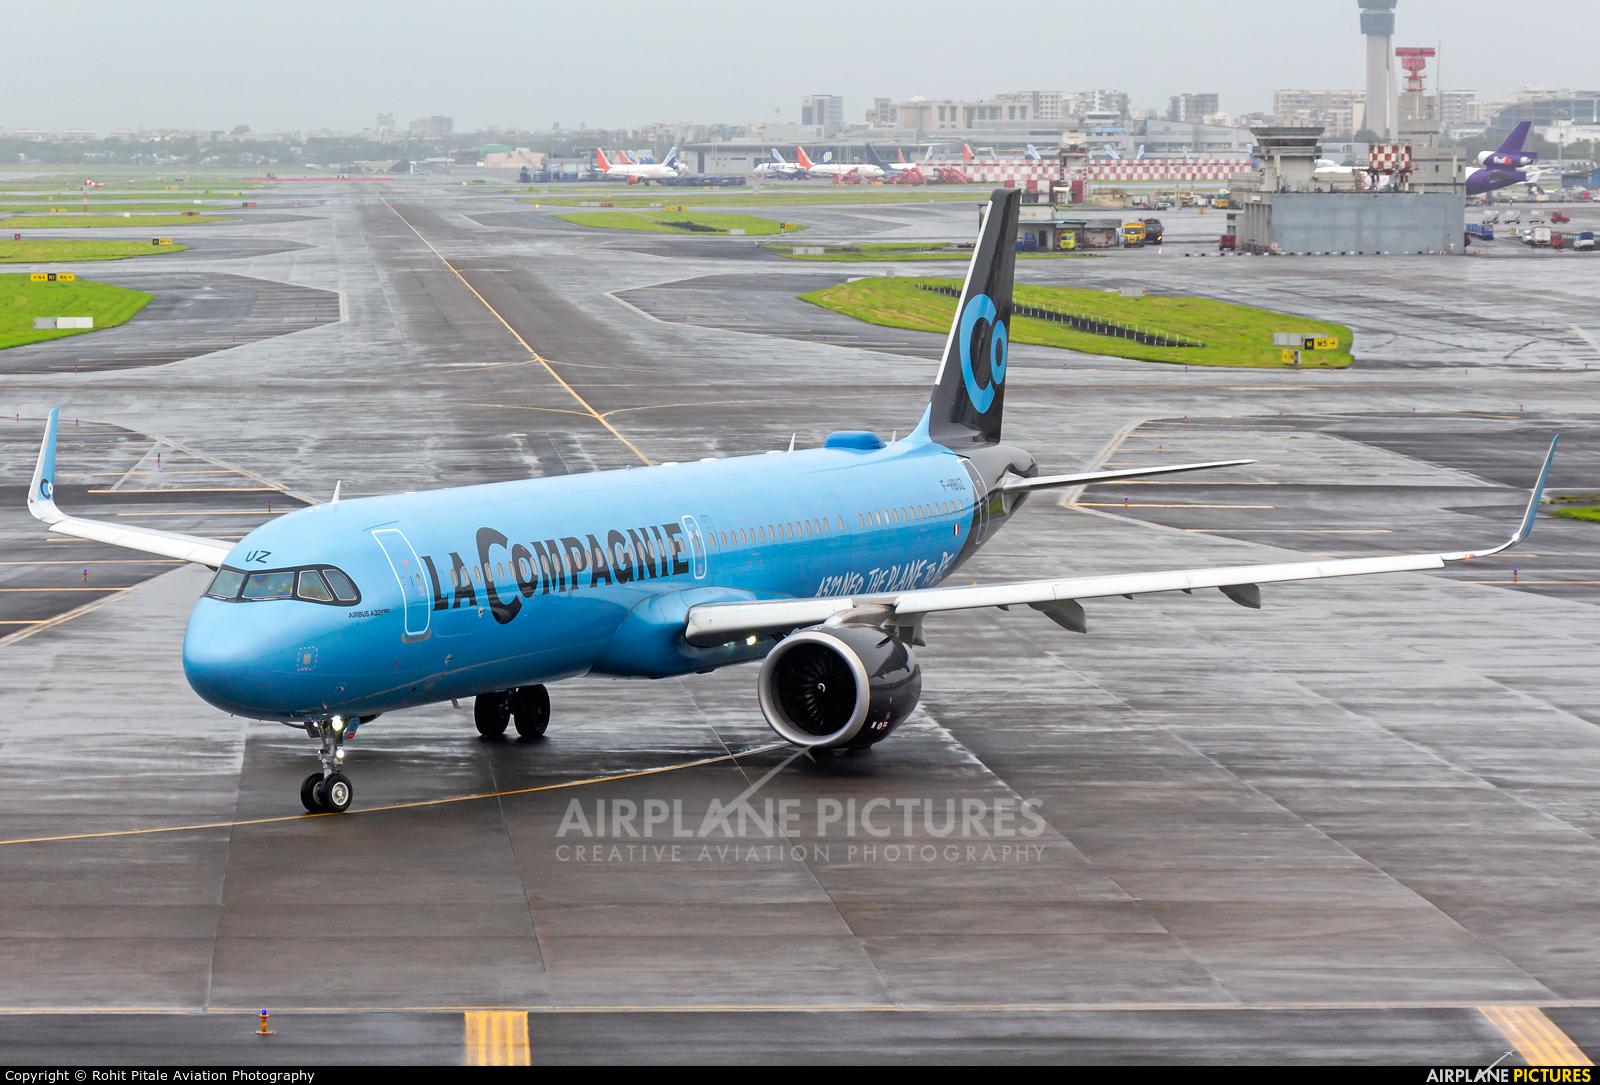 La Compagnie F-HBUZ aircraft at Mumbai - Chhatrapati Shivaji Intl